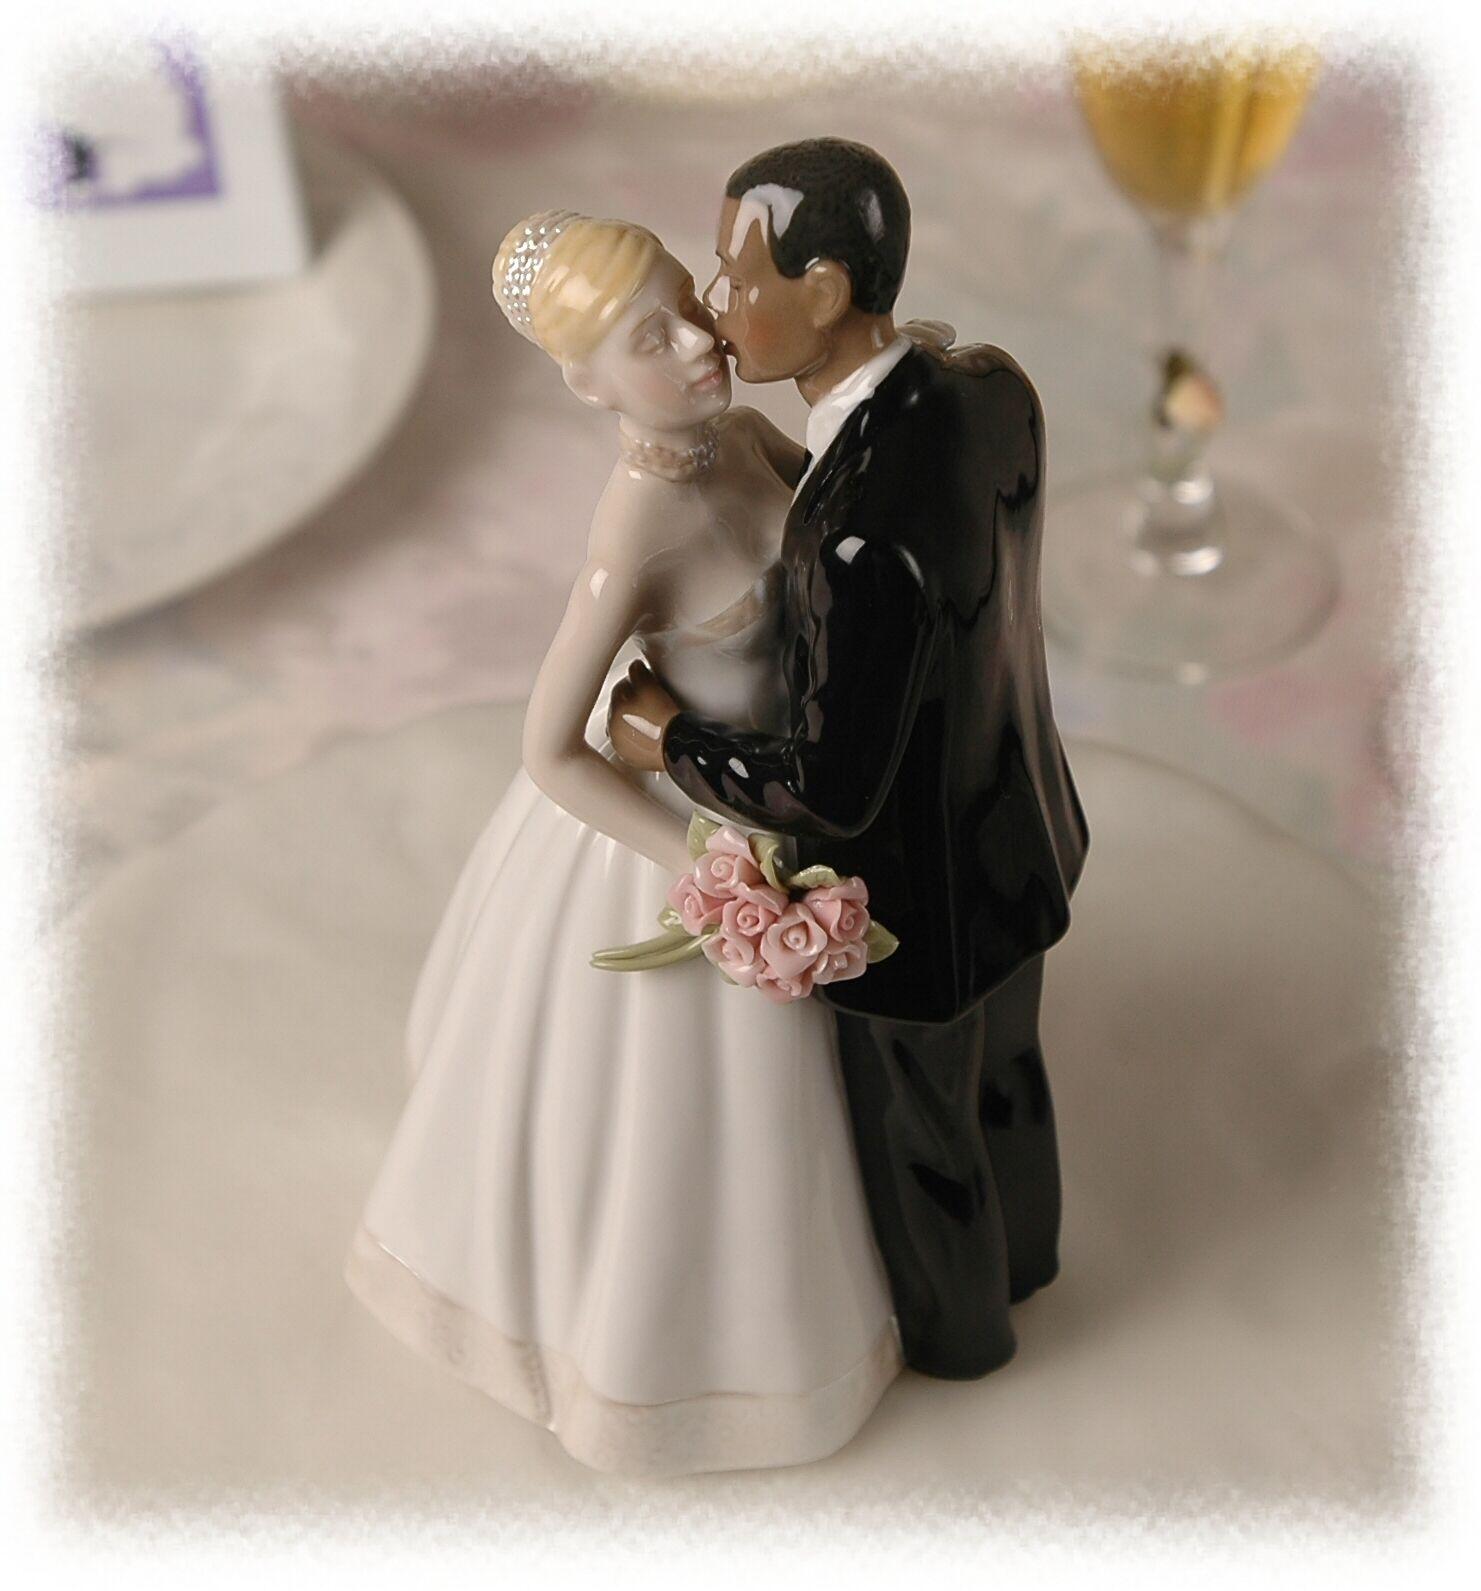 ... Wedding Cake Topper African American Groom White Blond Hair Bride